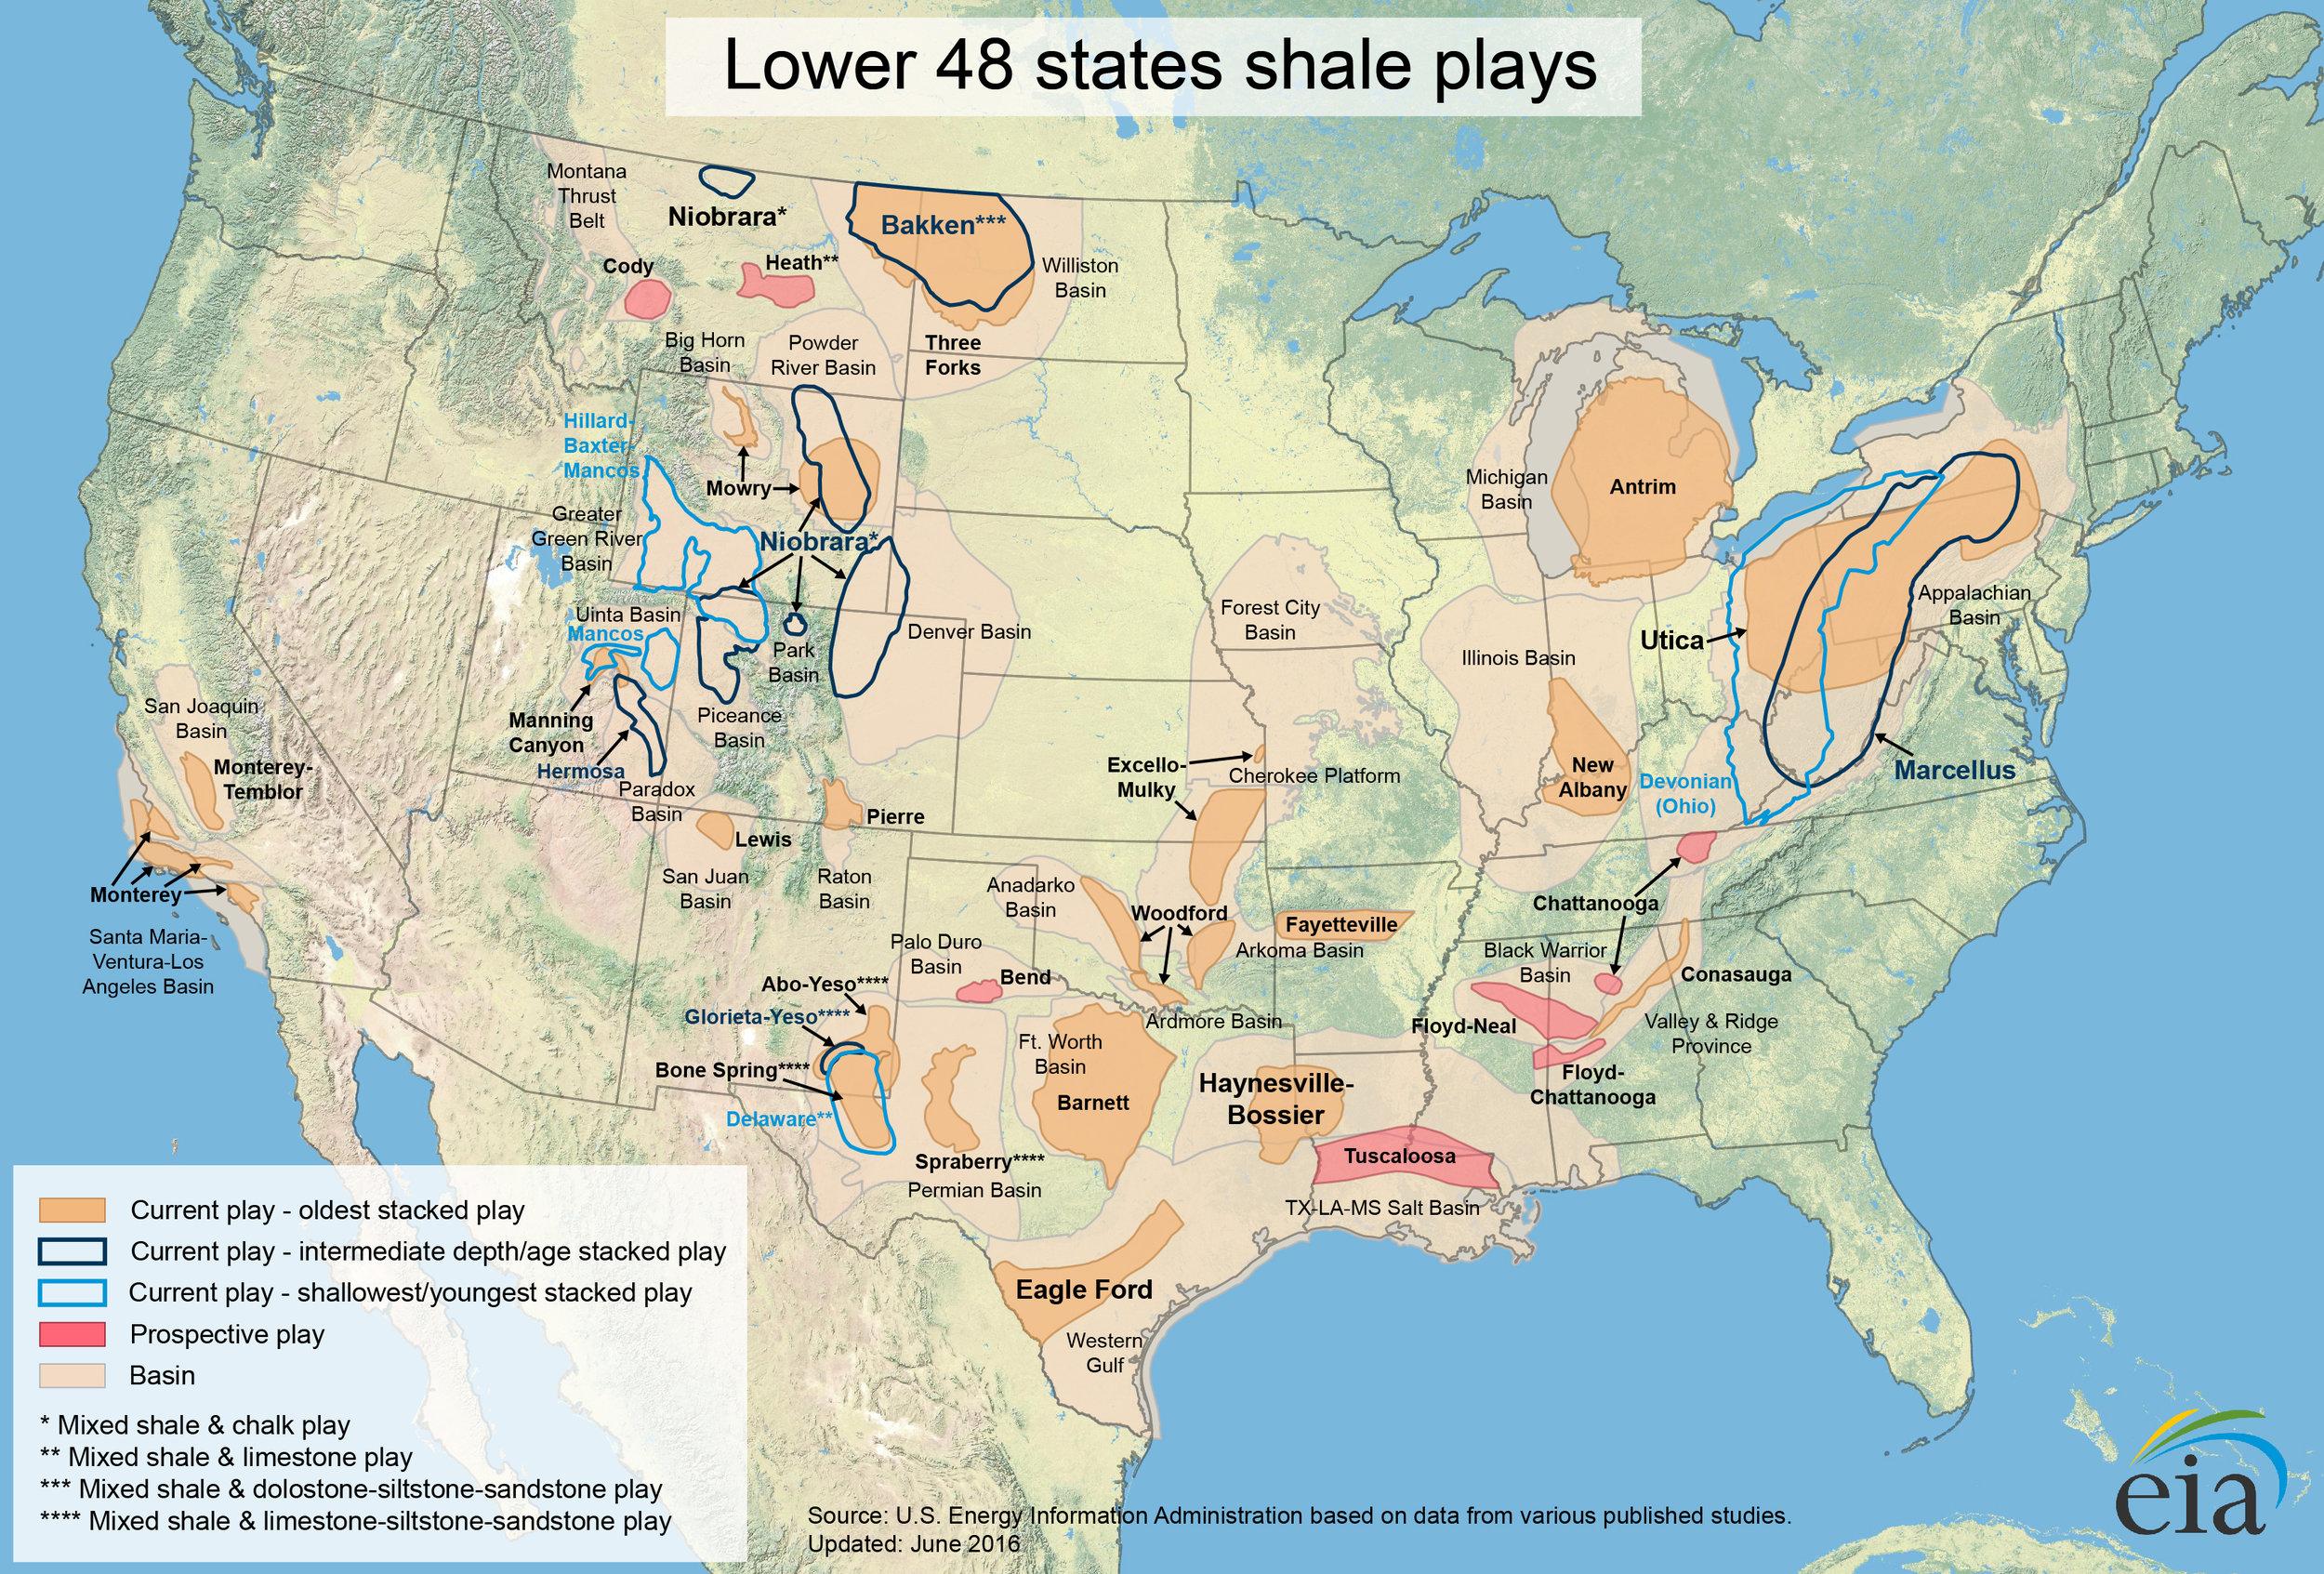 shale_gas_lower48.jpg